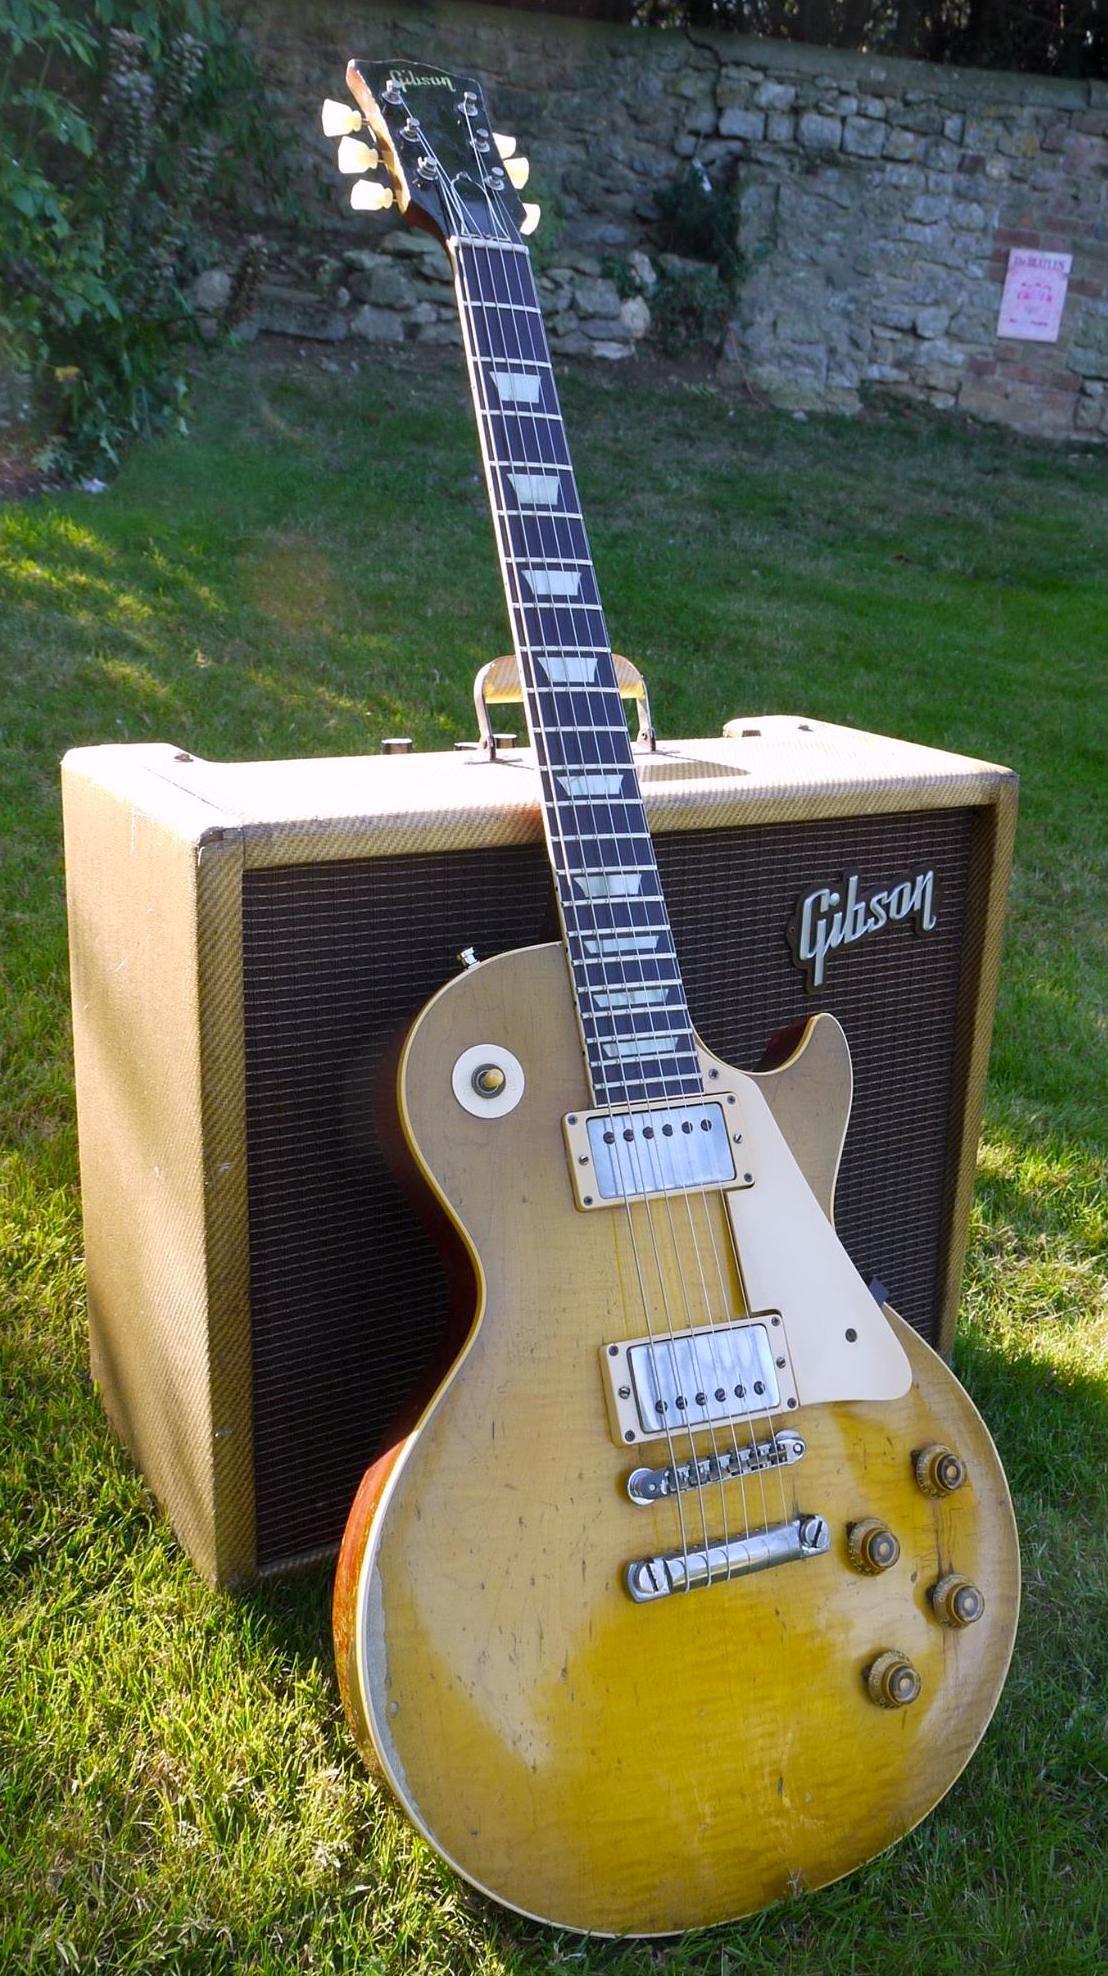 Bernie Marsdens 1959 Gibson Les Paul Standard The Beast Guitar Les Paul Guitars Cheap Electric Guitar